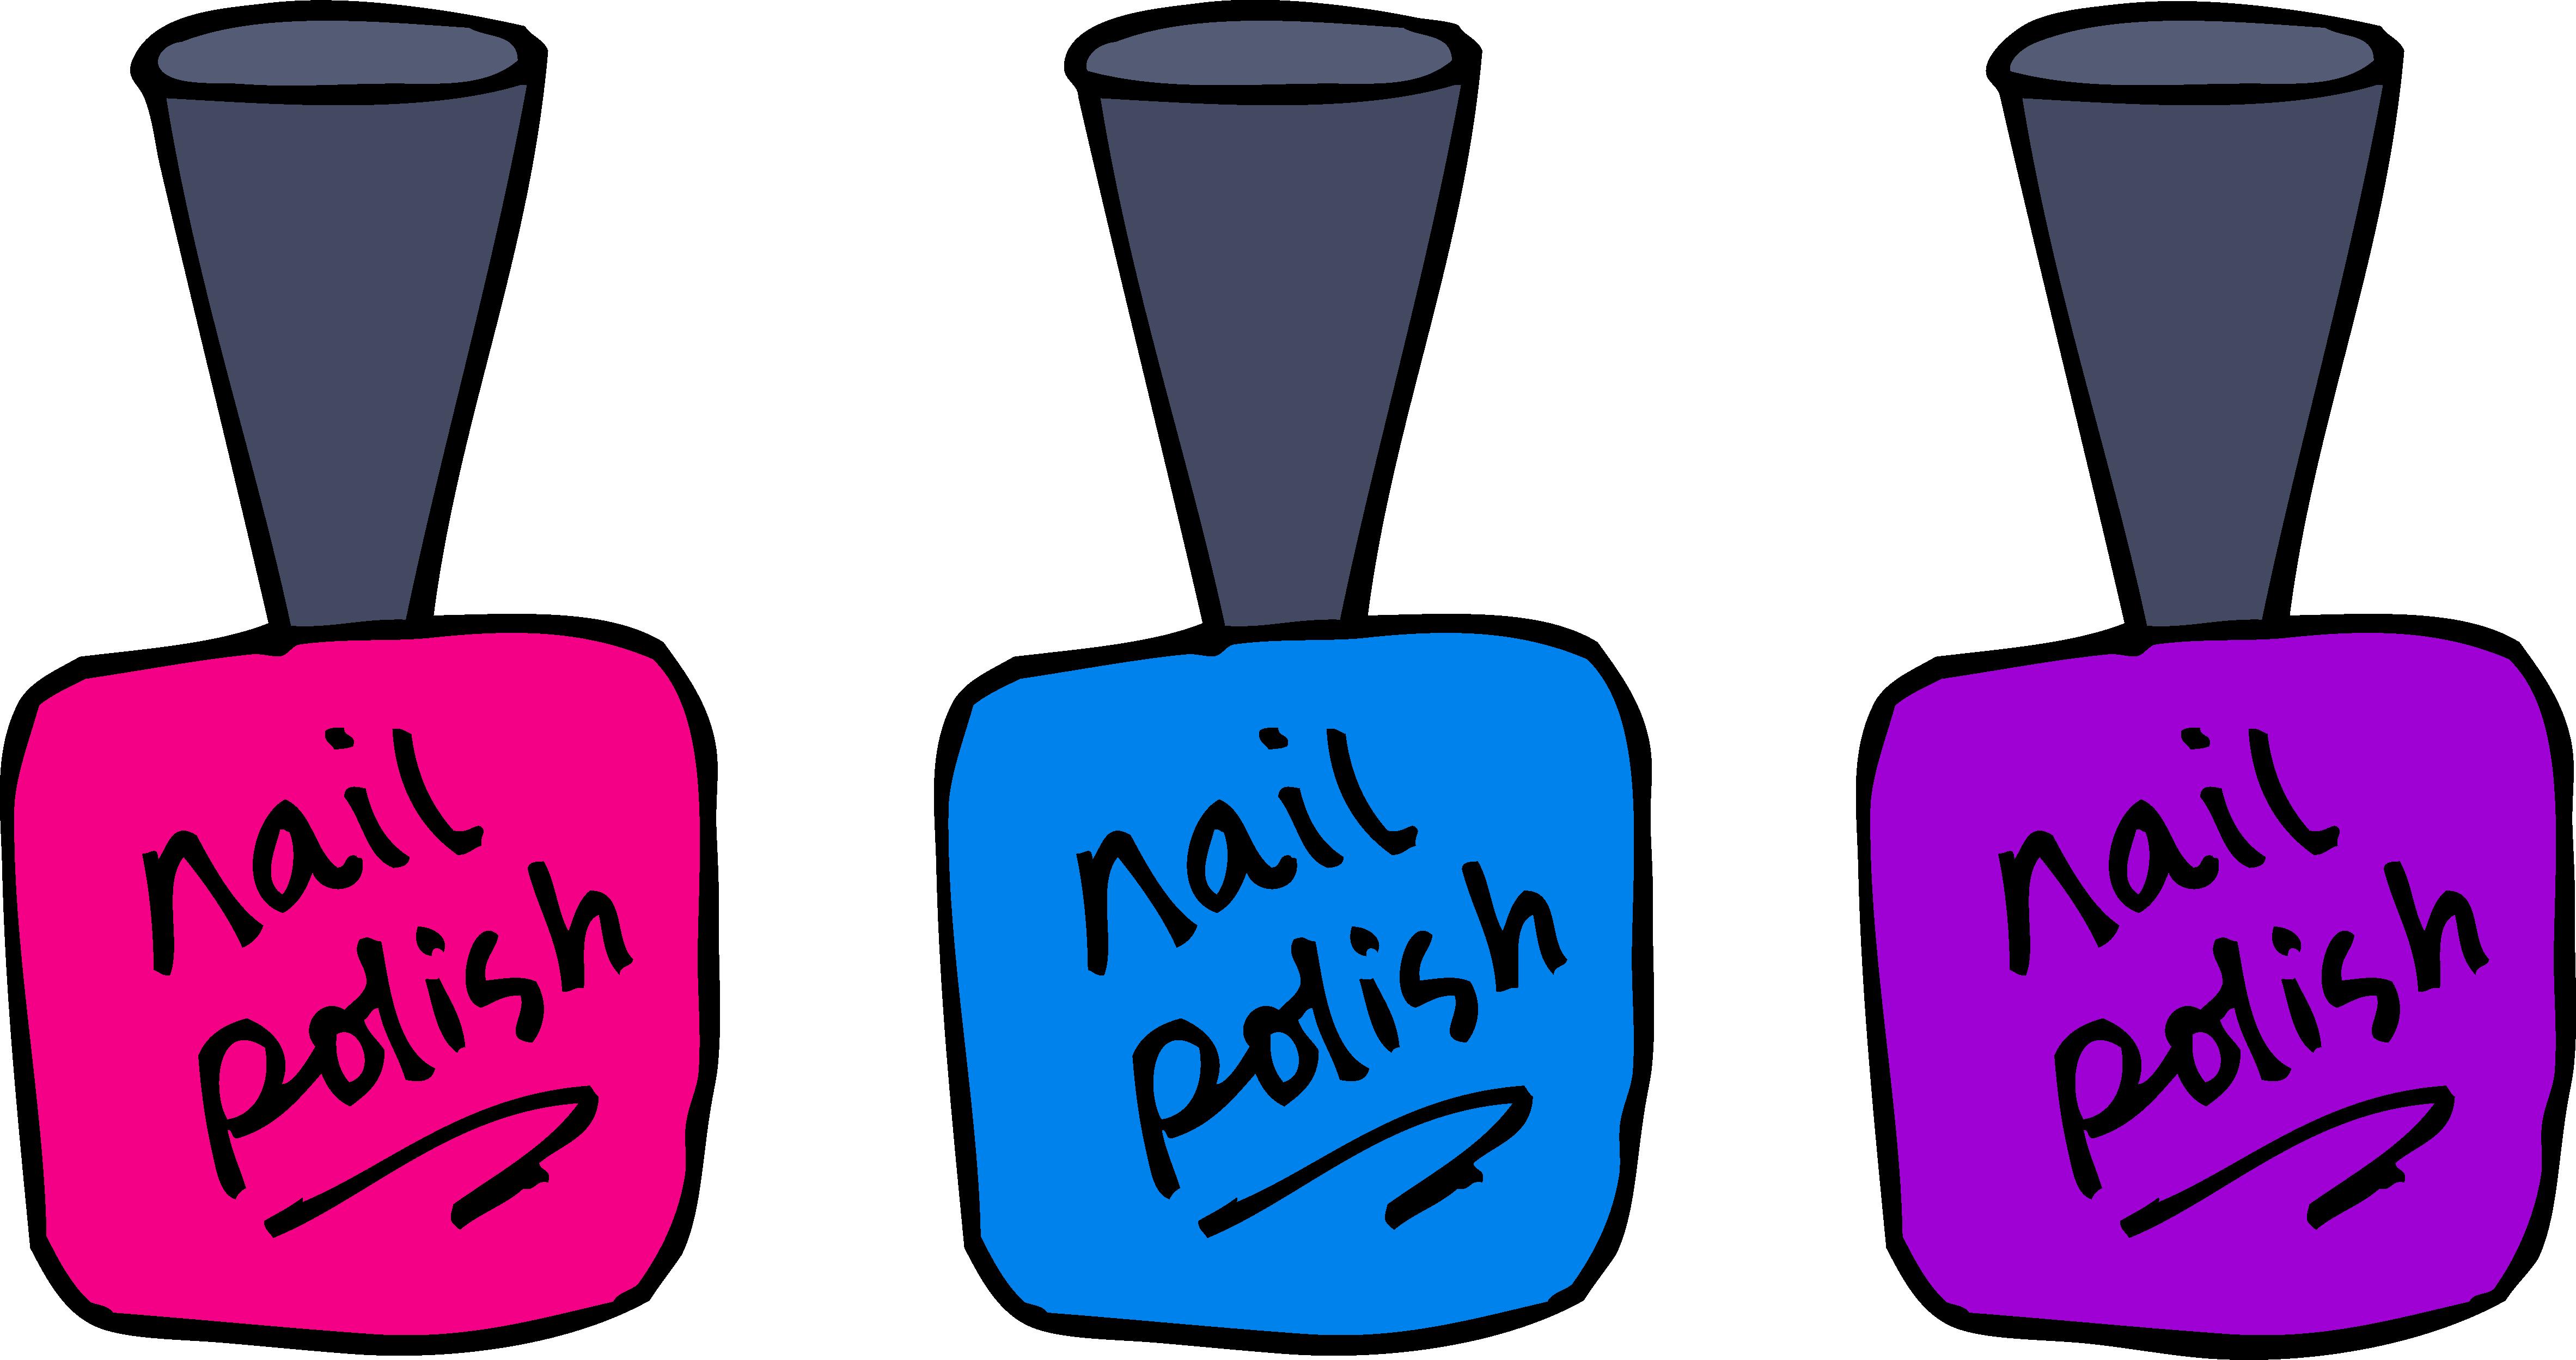 Nail Polish Clip Art-Nail Polish Clip Art-1